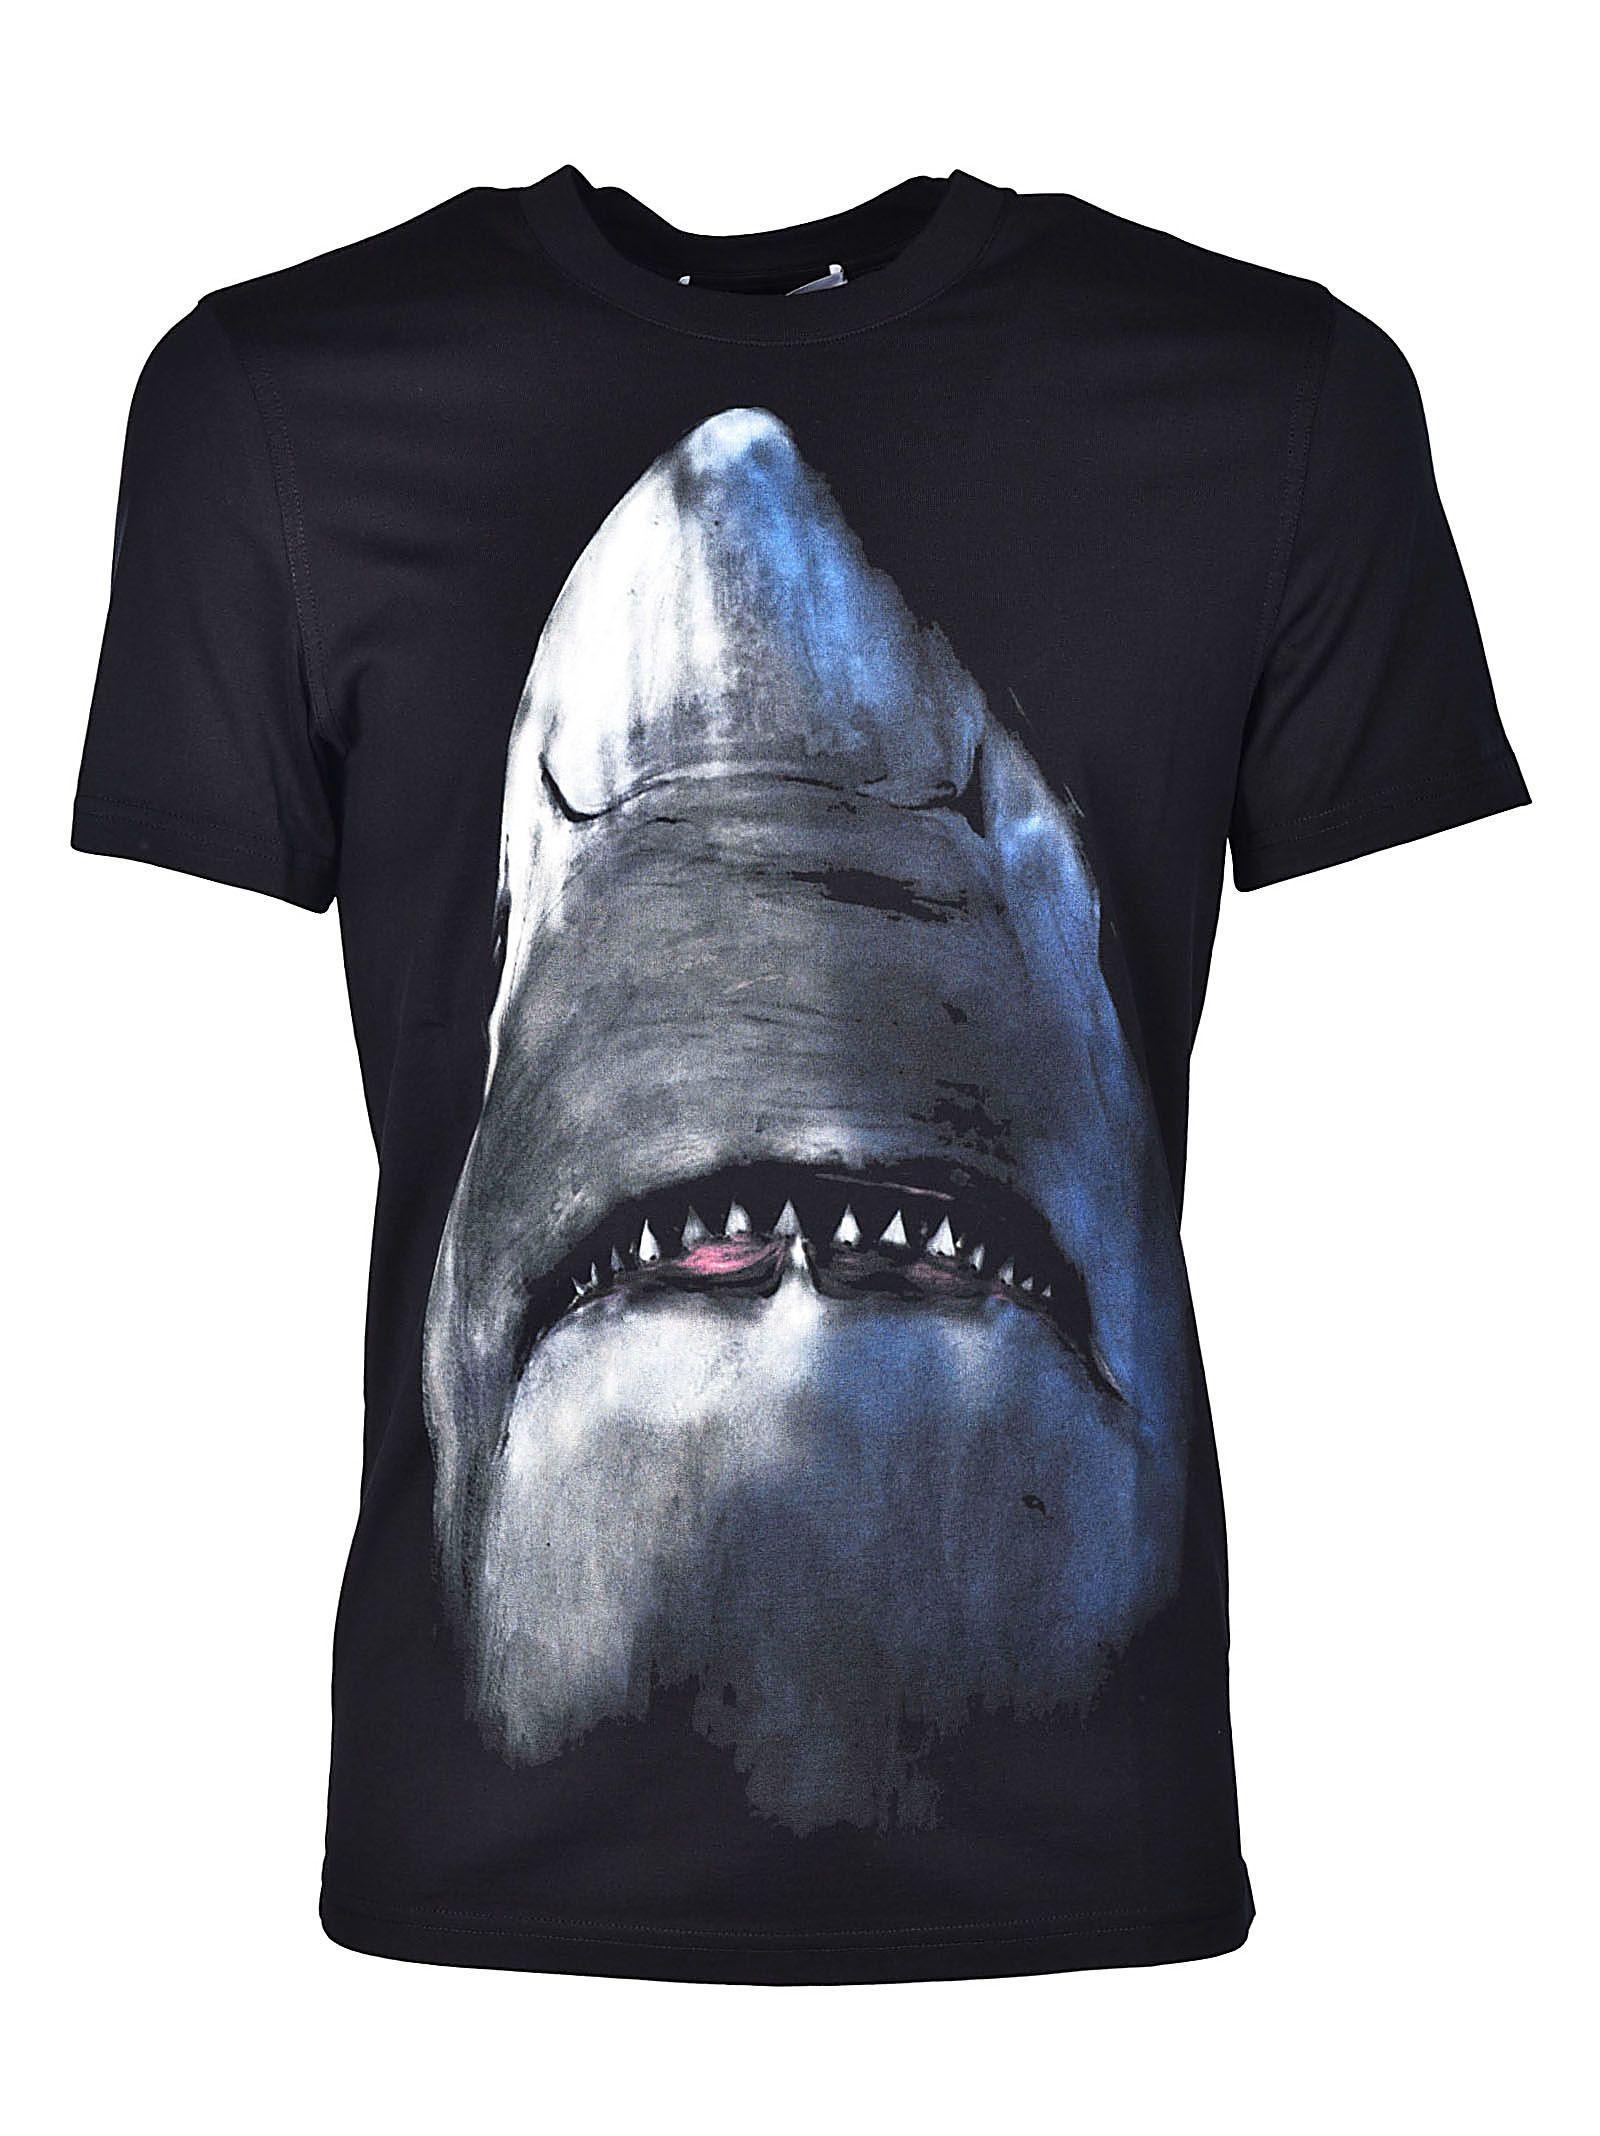 Givenchy Shark Print T-shirt In Black